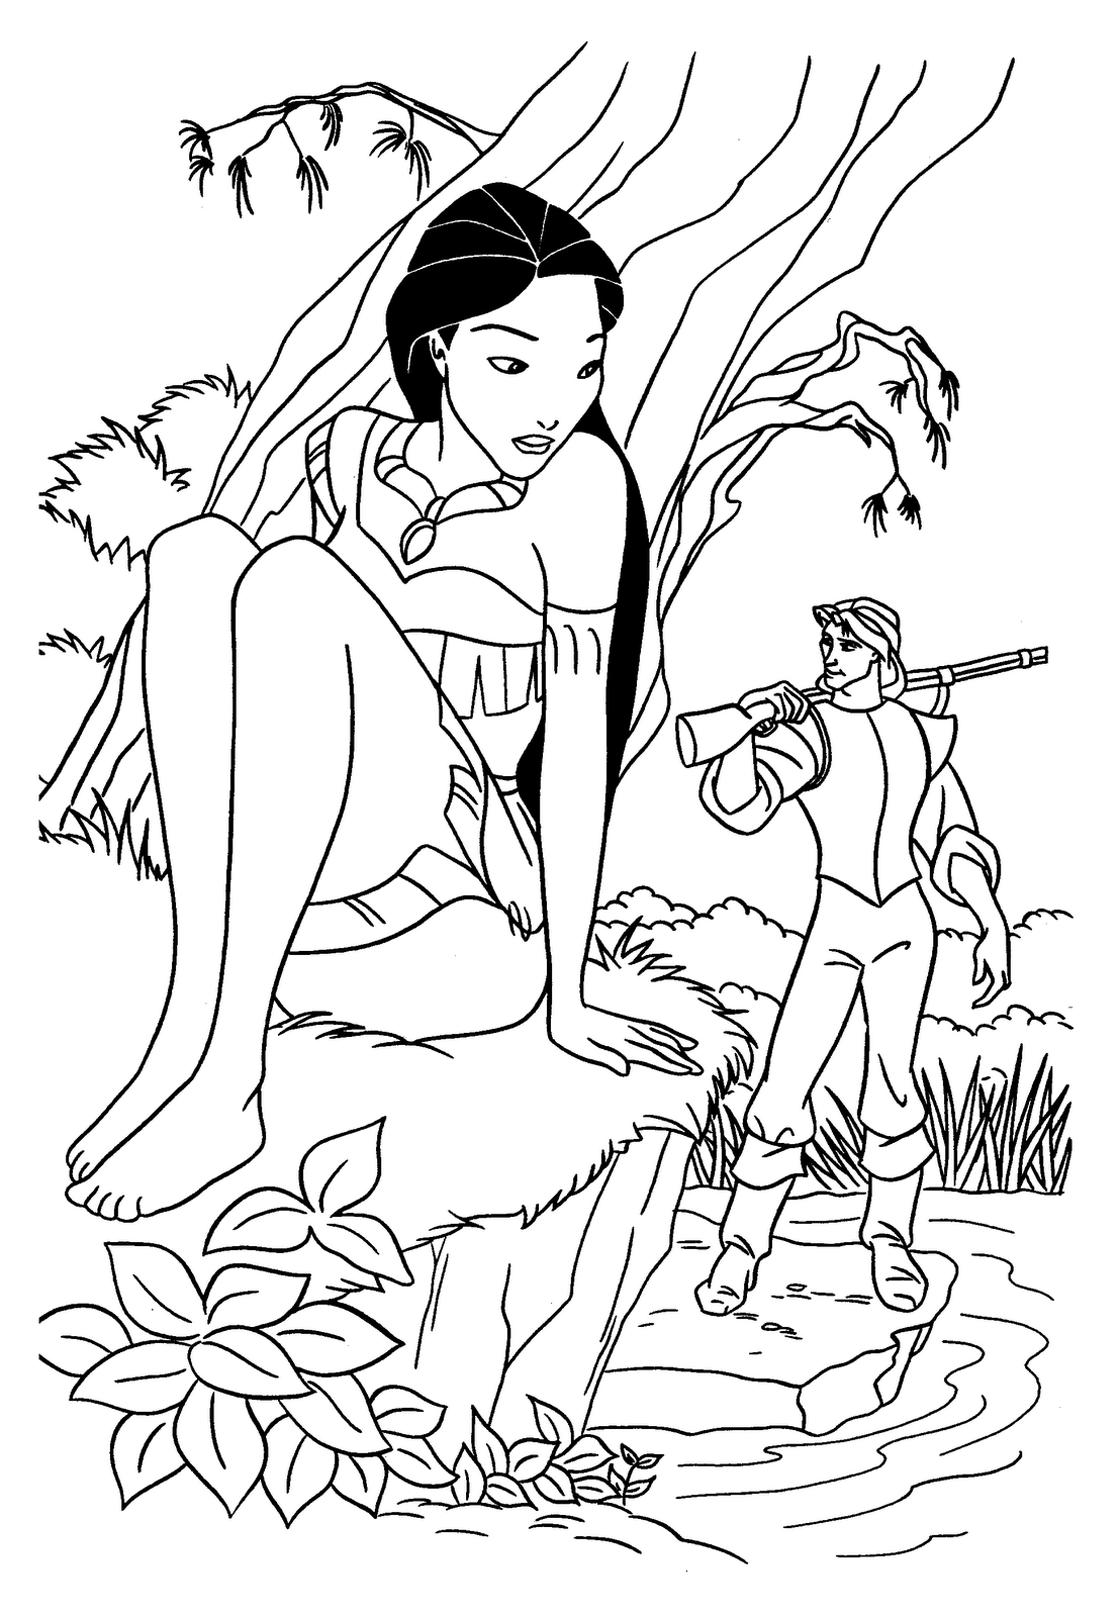 Coloriage de Pocahontas à imprimer - Coloriage Pocahontas ...